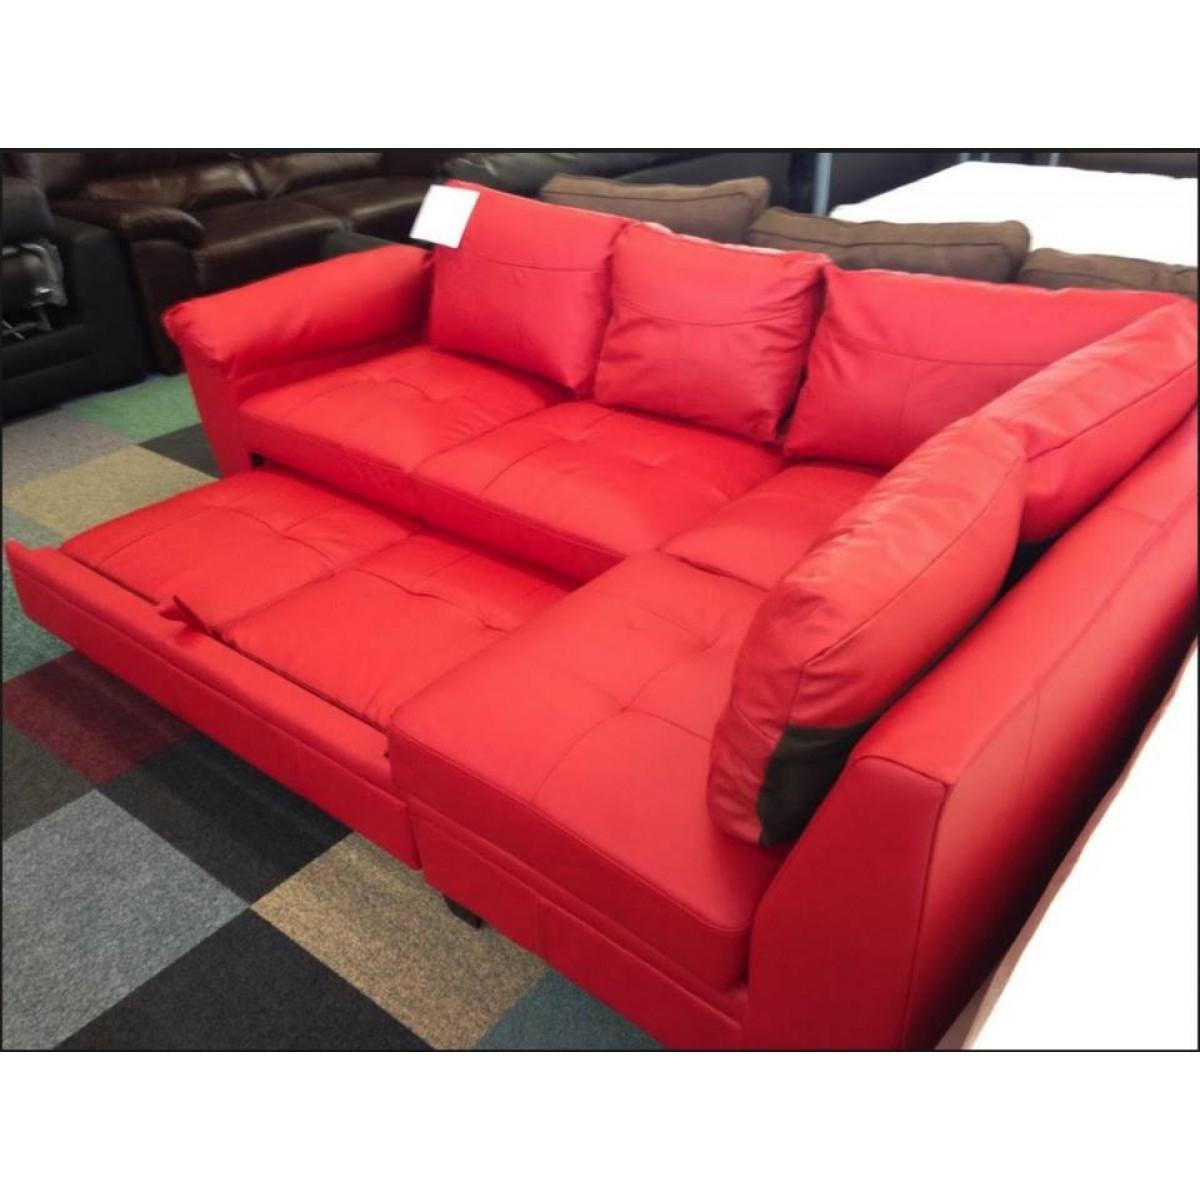 Fernando Leather Right Hand Sofa Bed Corner Group Black Regarding Leather Corner Sofa Bed (Image 4 of 15)